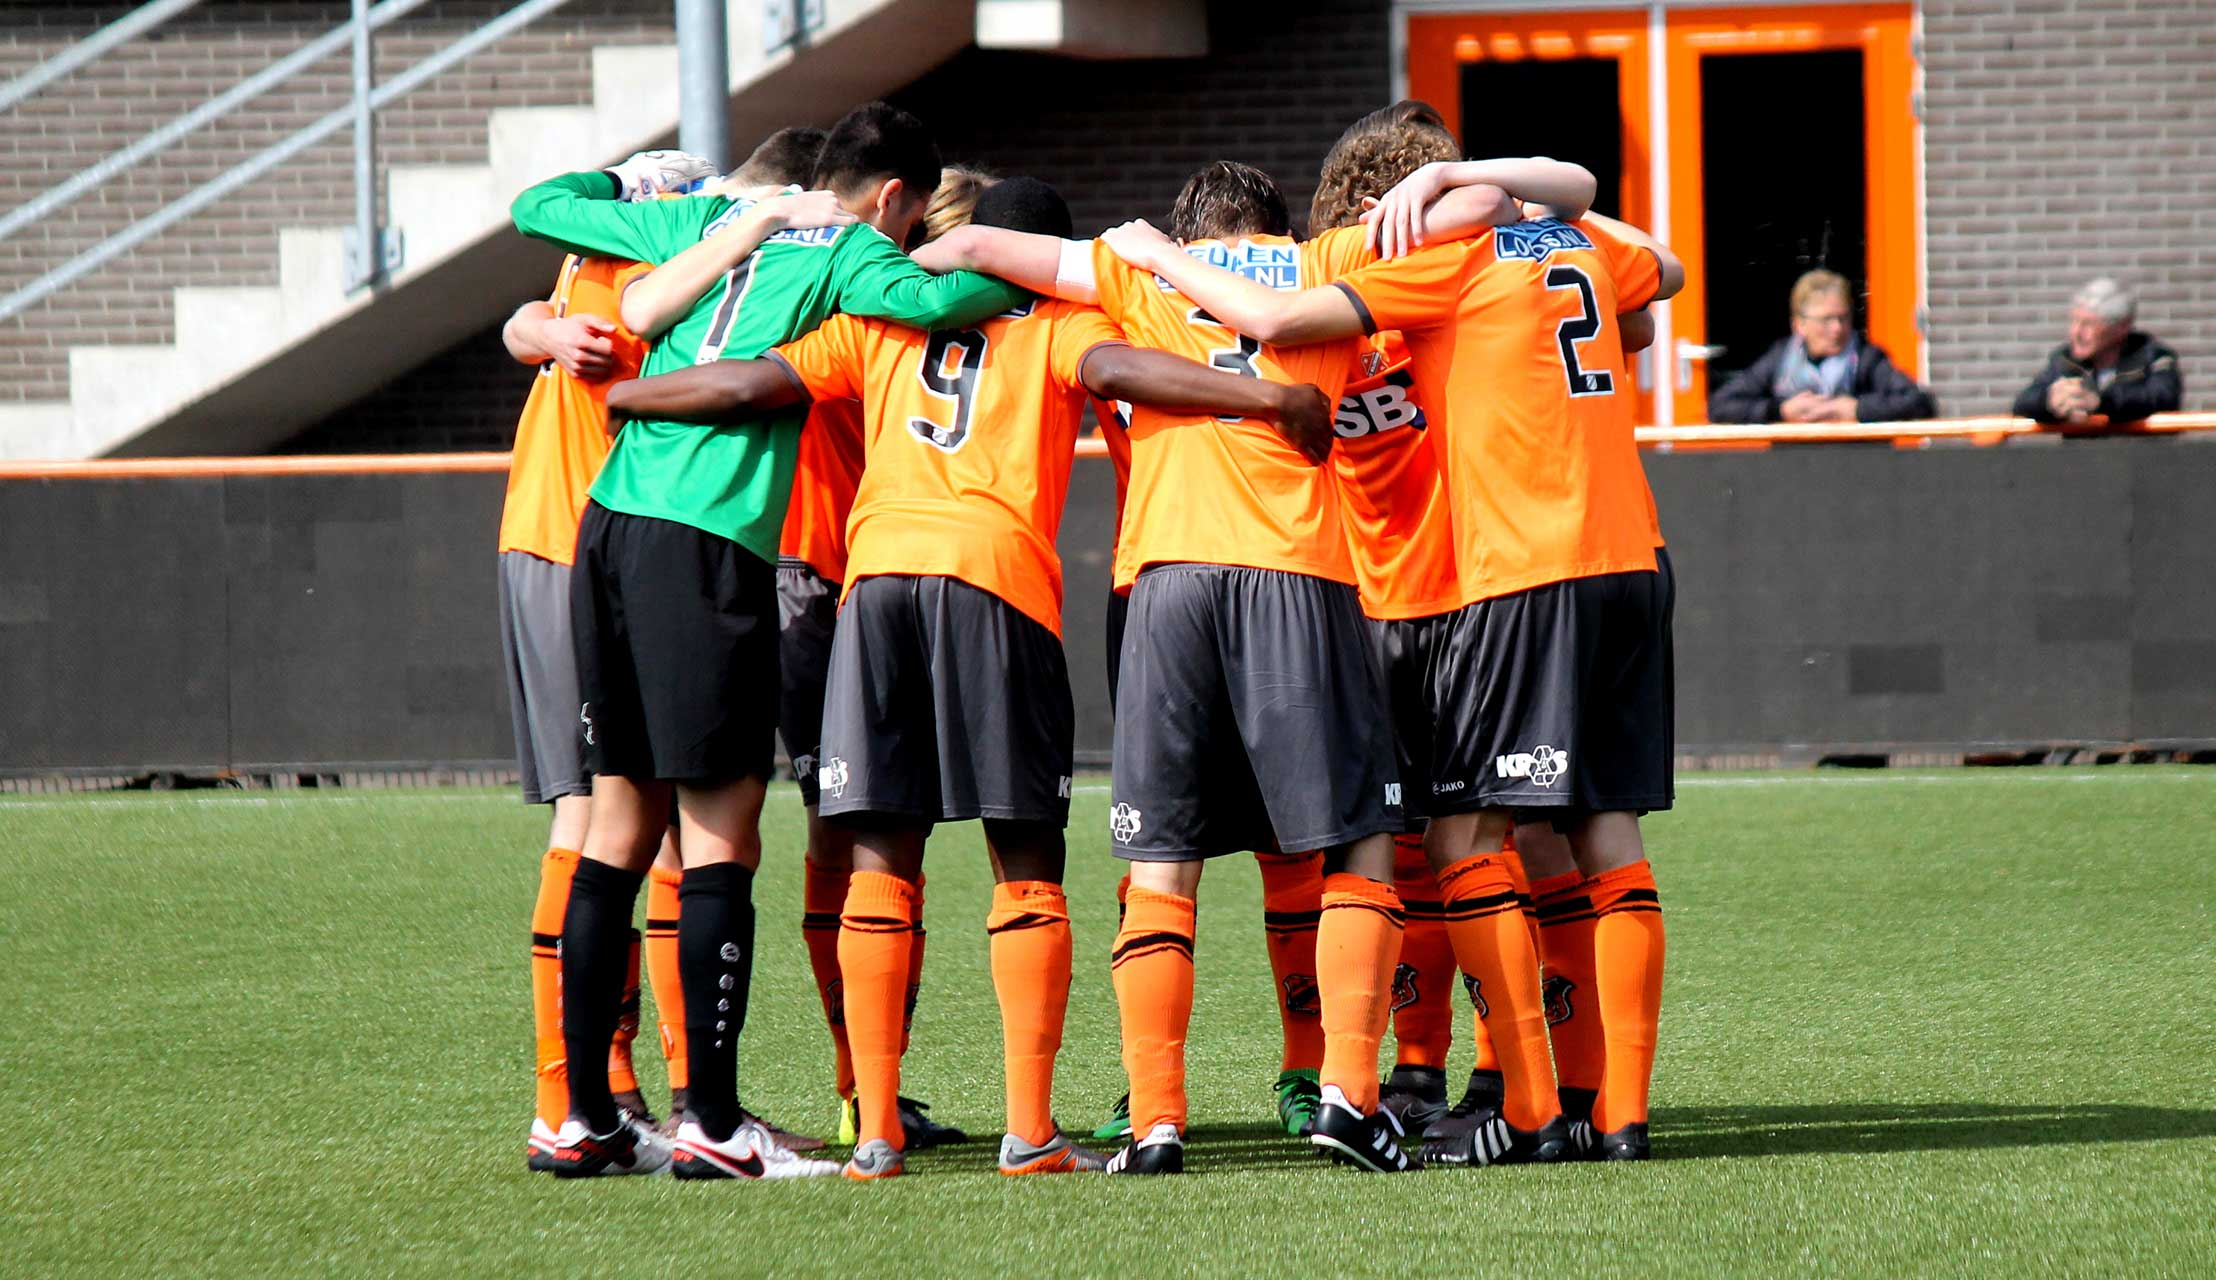 Fotoverslag FC Volendam O18 - VA N.E.C. O18 (Fotograaf: Saskia Koppes)